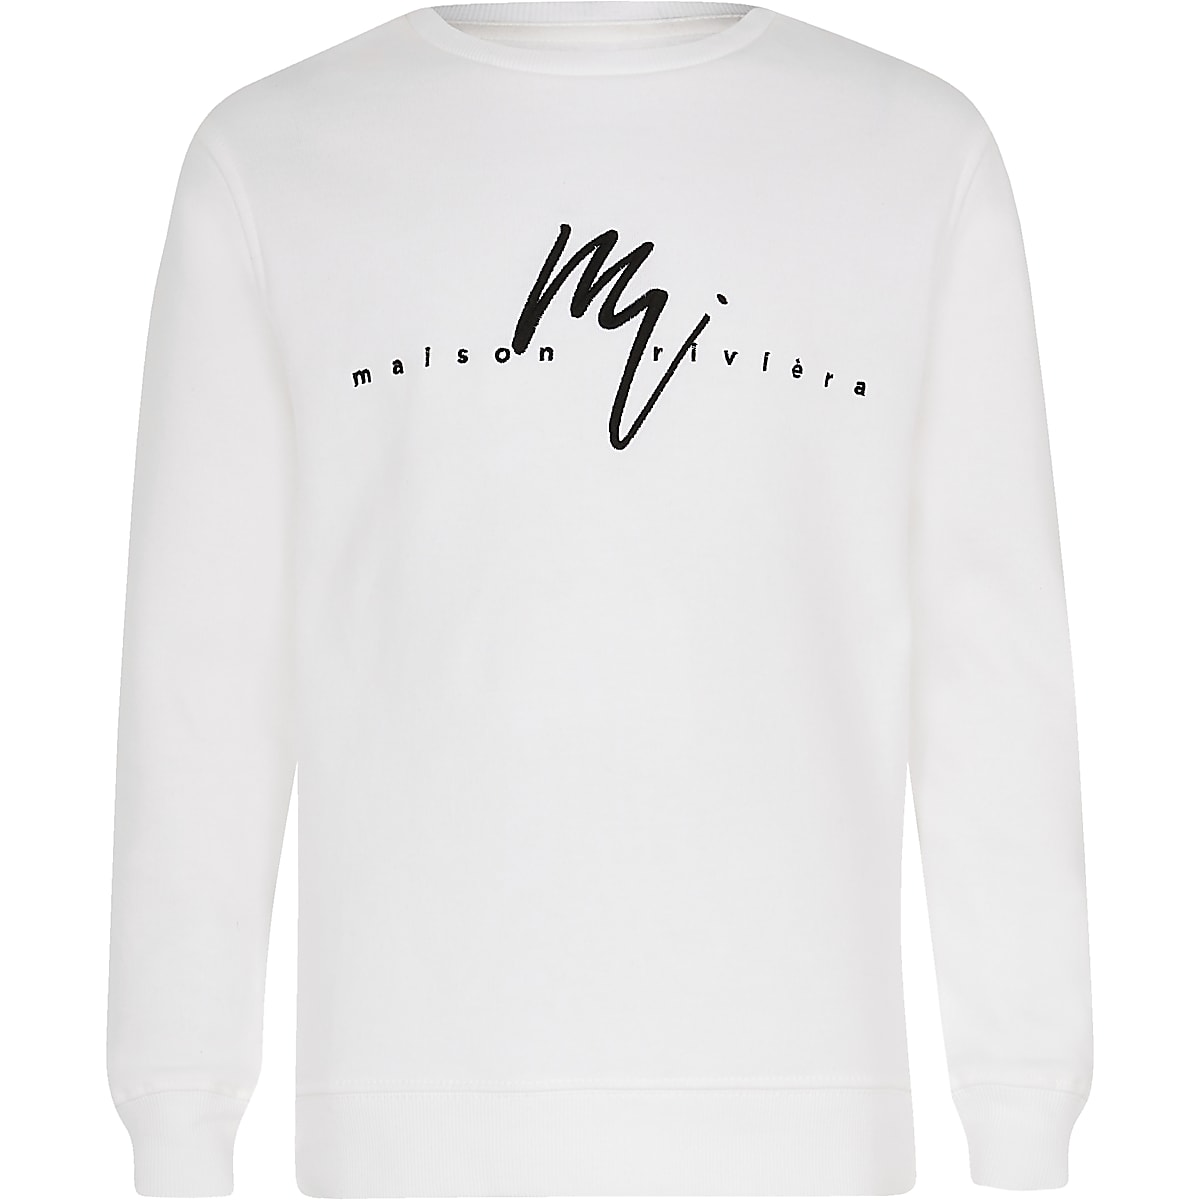 Boys White Masion Riviera Sweatshirt - Hoodies  Sweatshirts - Boys-7632